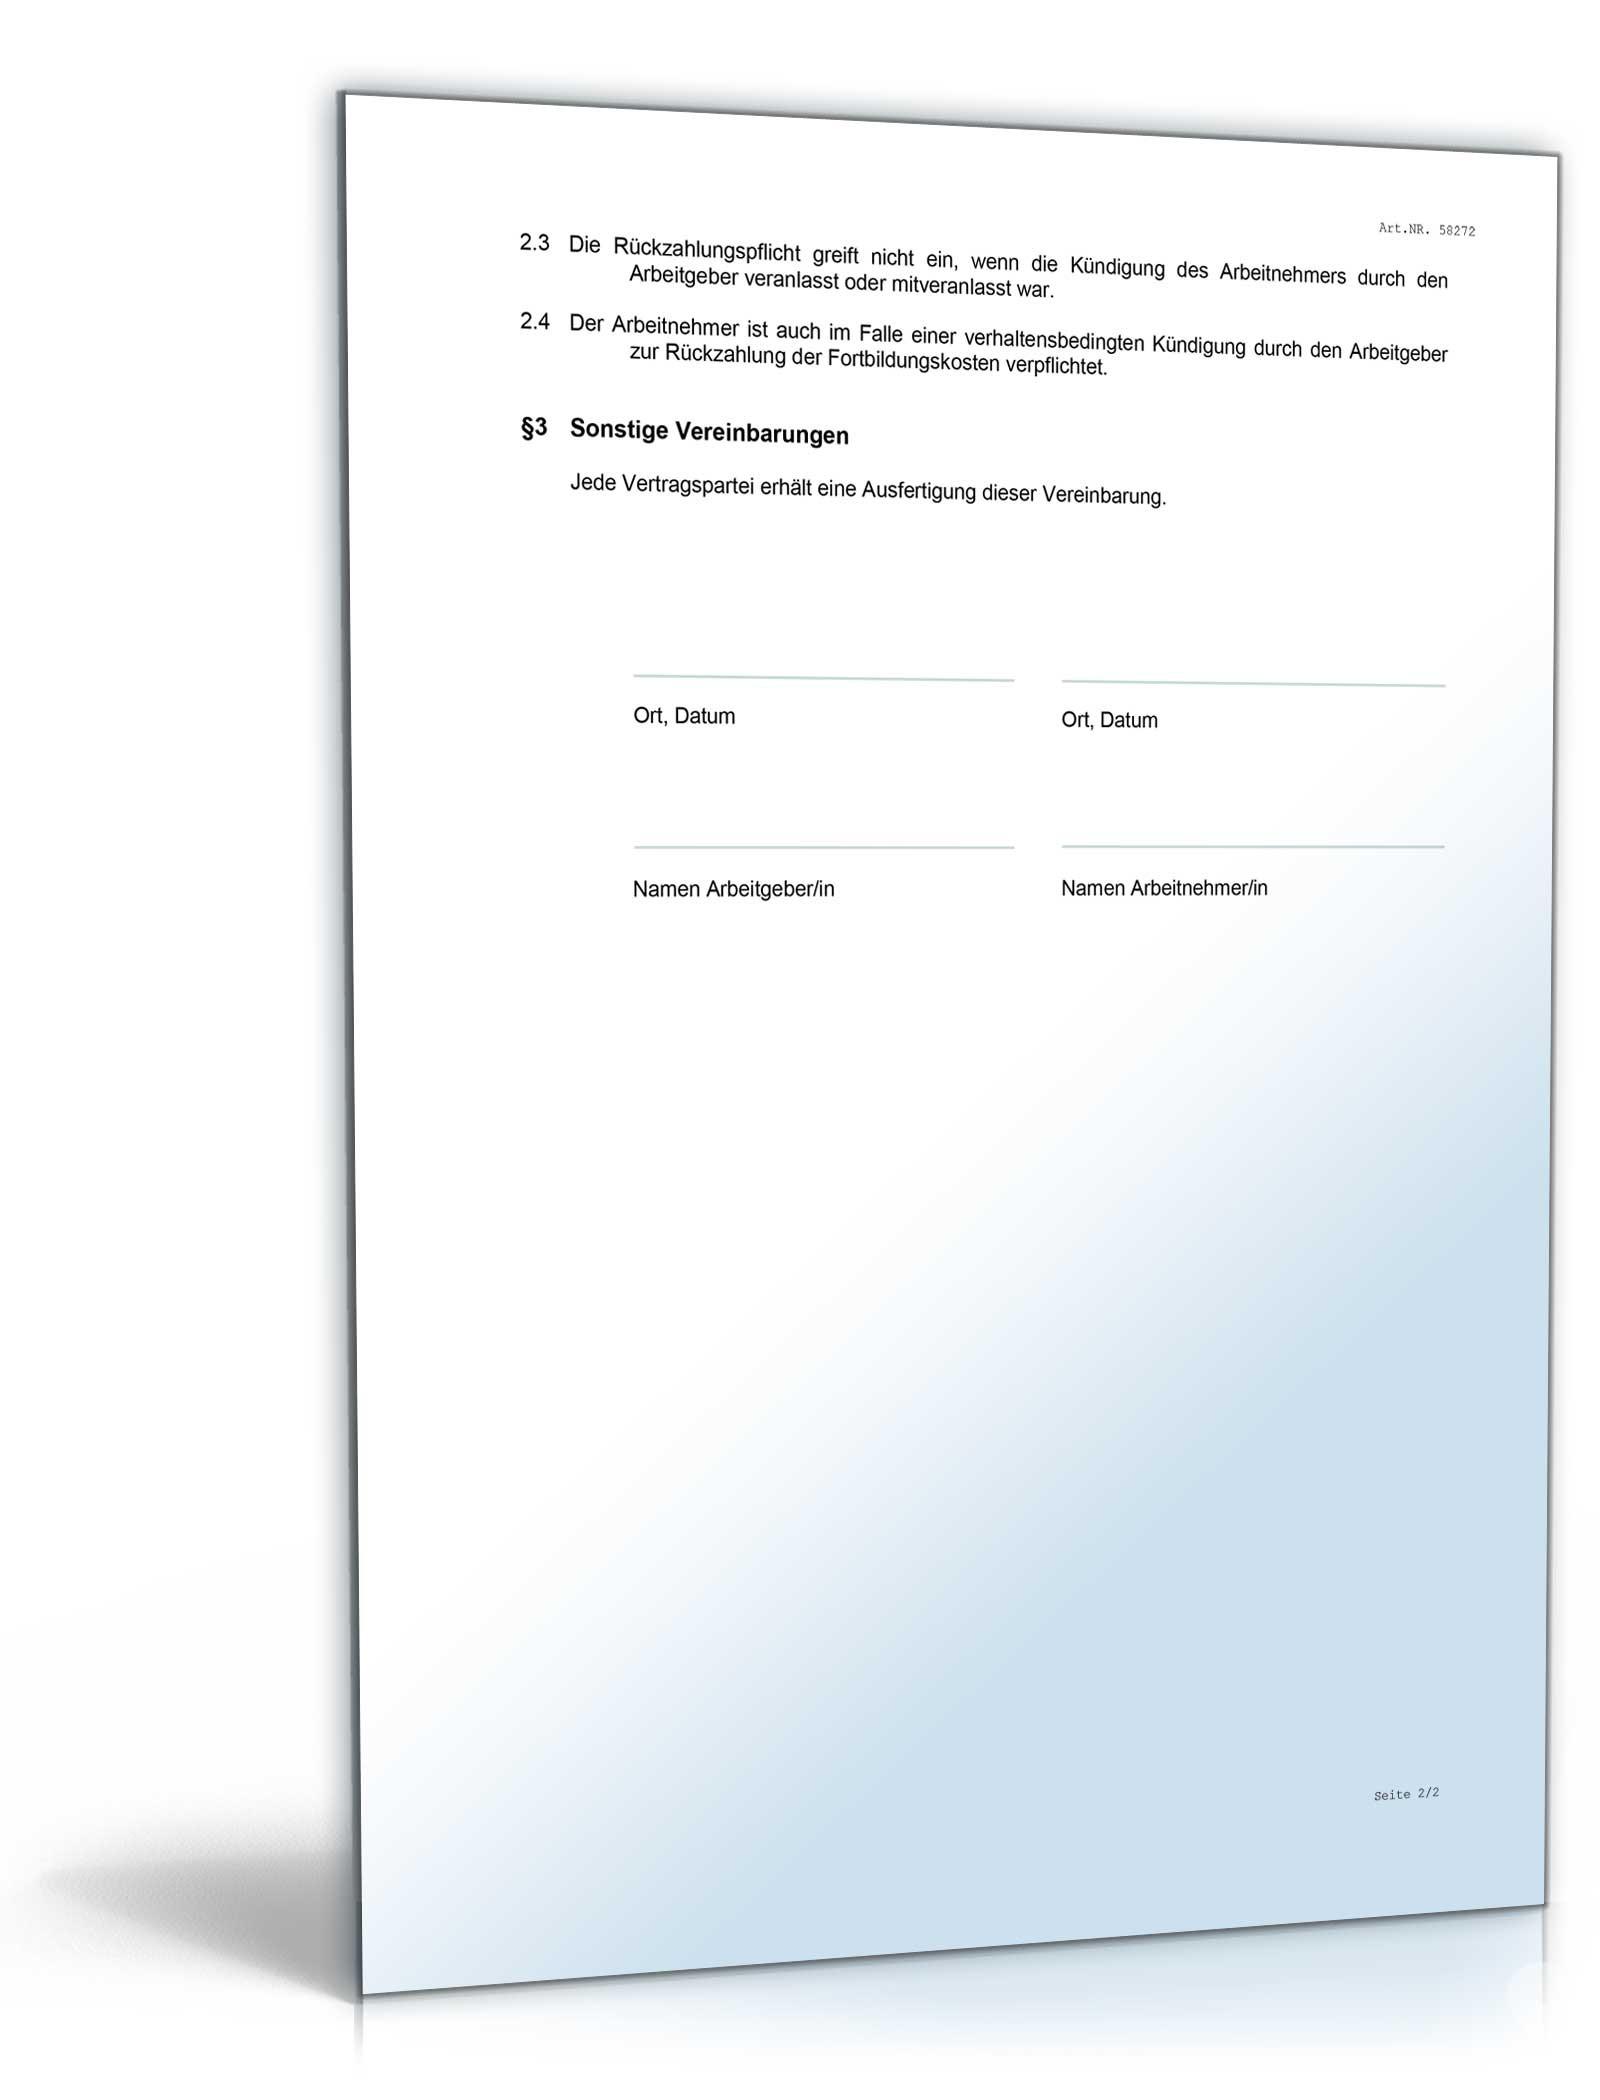 Großzügig Vorlagenrouter Galerie - Entry Level Resume Vorlagen ...